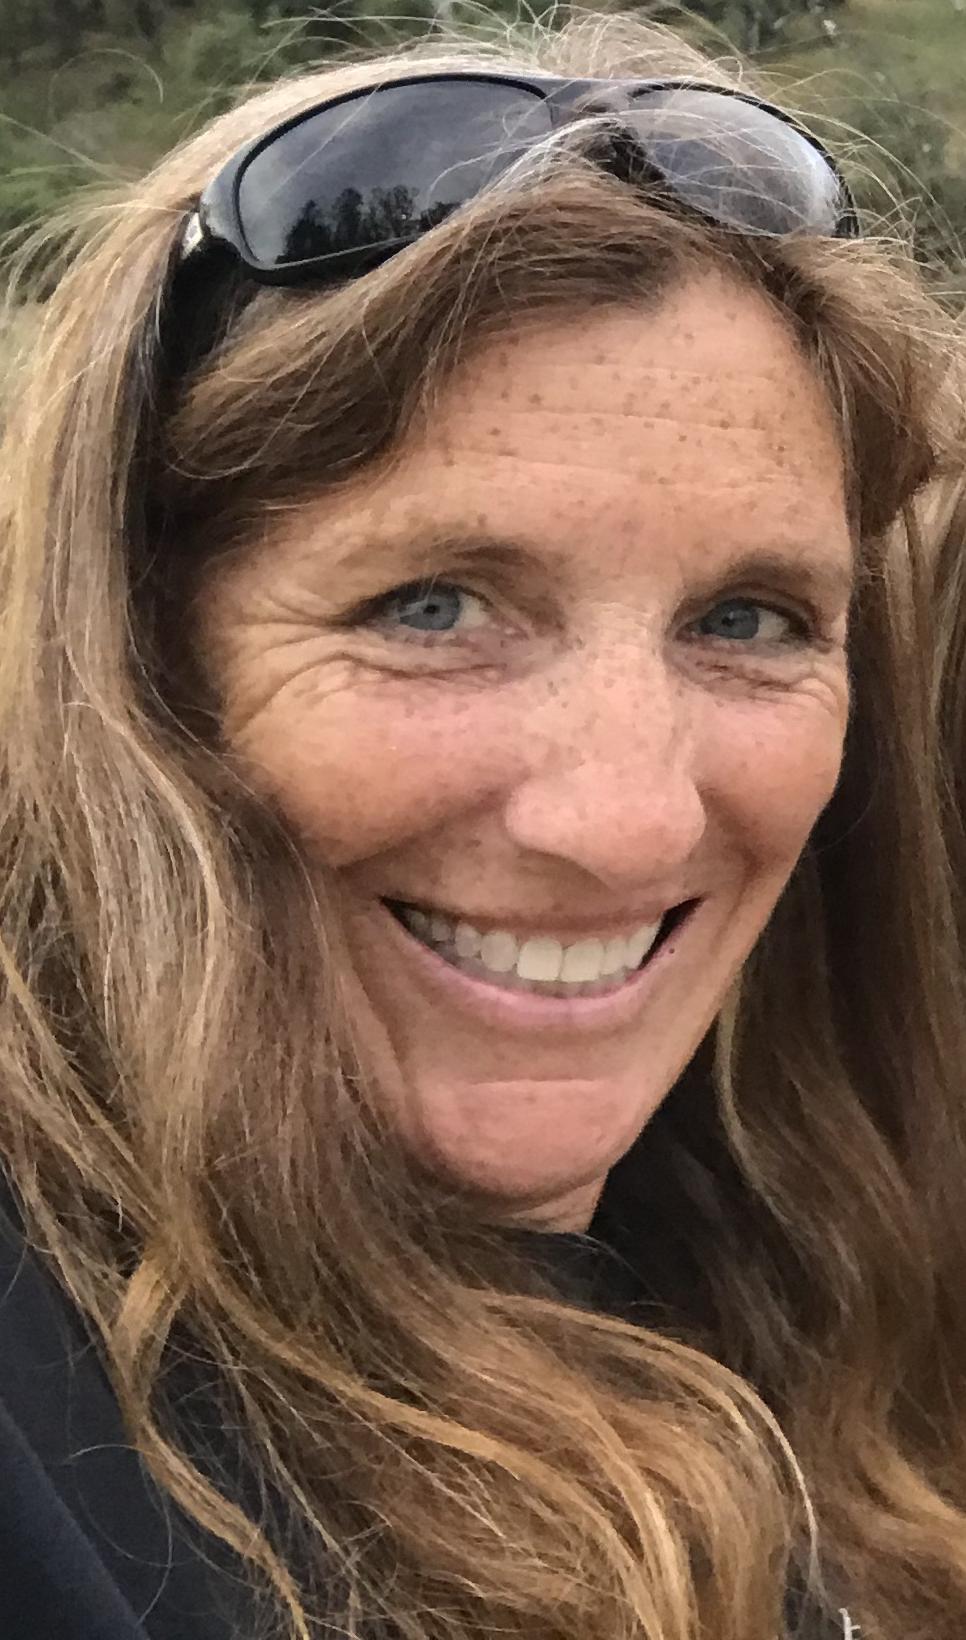 profile Heidi 2018.png